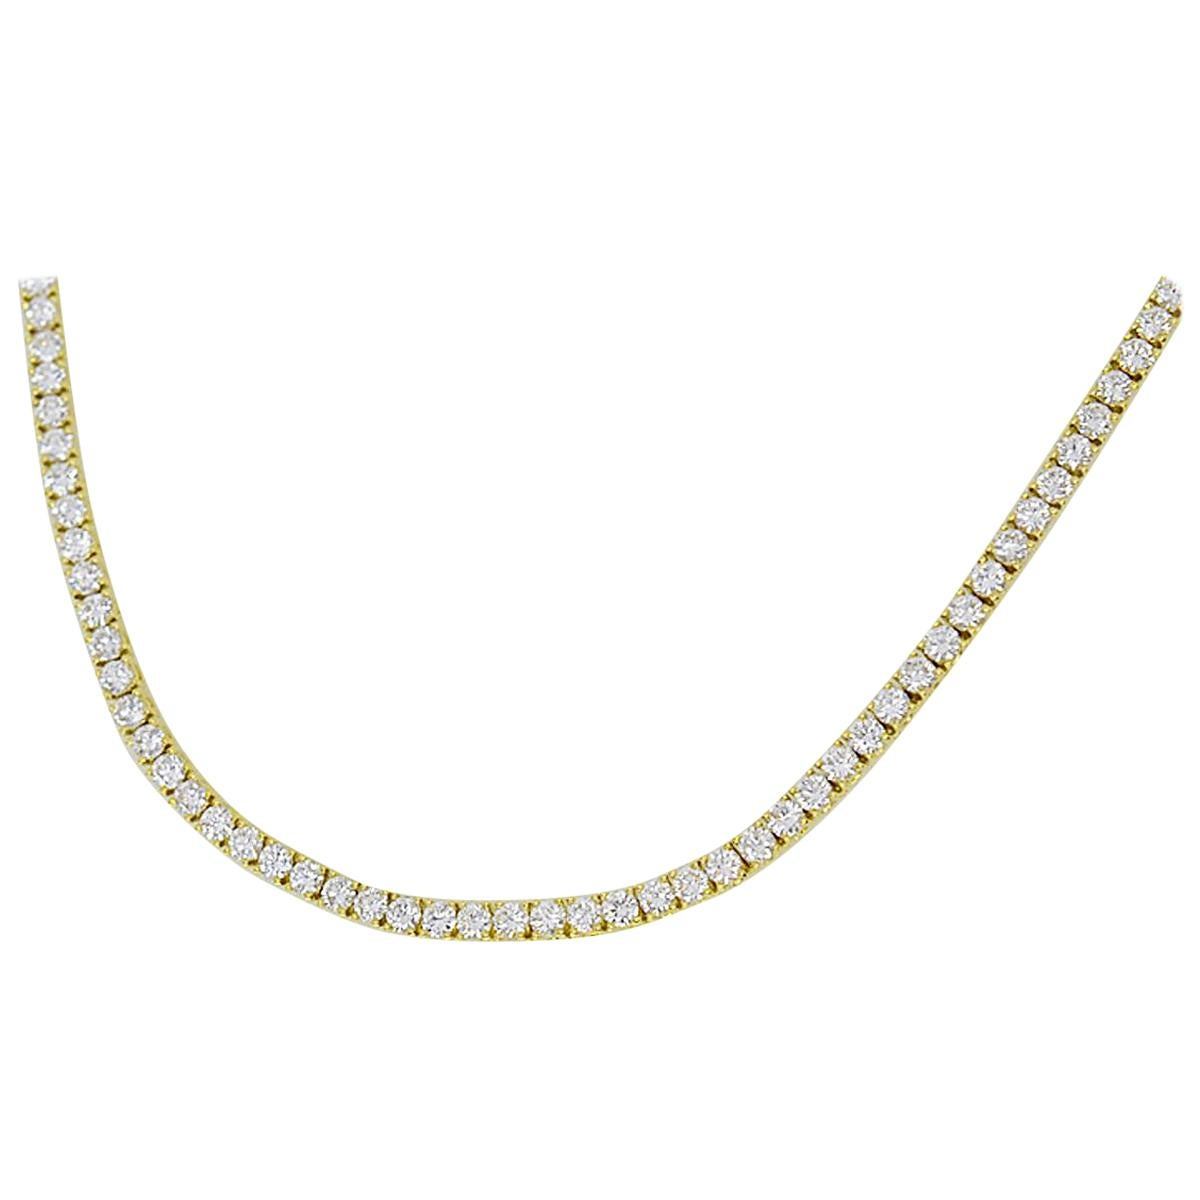 Cartier Diamond 18 Karat Yellow Gold Tennis Necklace 40cm